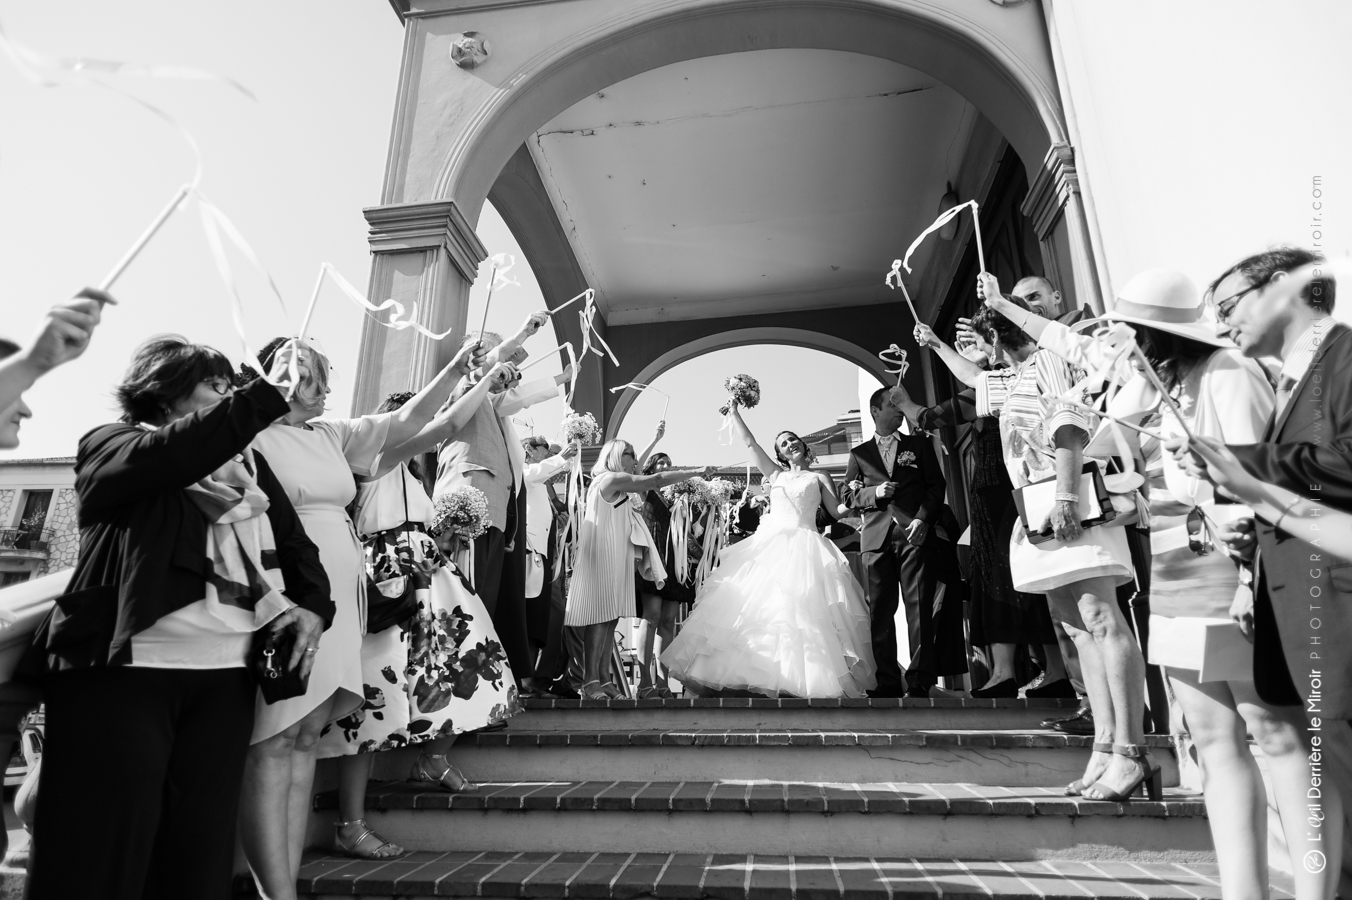 mariage-cj-vaugrenier-loeilderrierelemiroir-045